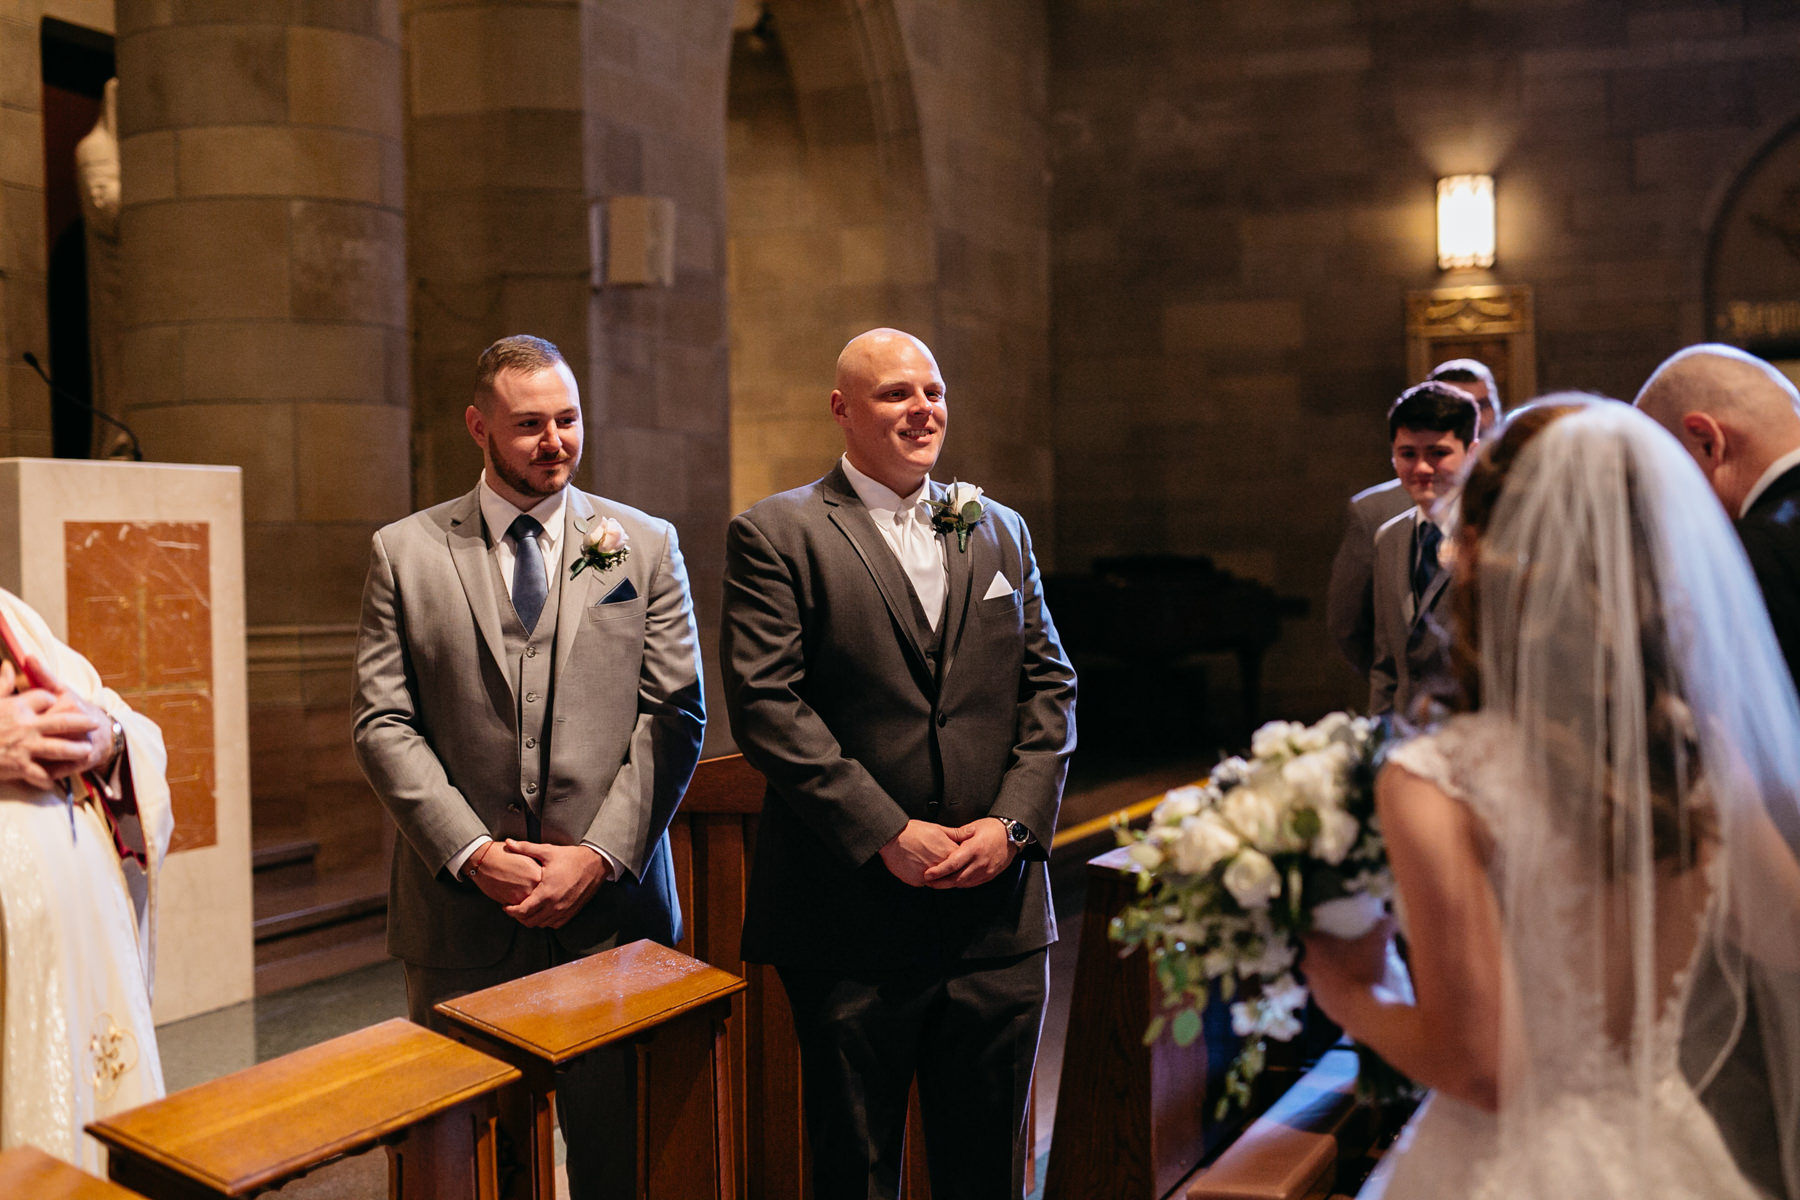 Quincy Ma Massachusetts Wedding Dedham Boston Granie Links Wedding New England Catholic Cathedral Liz Osban Photography 39.jpg